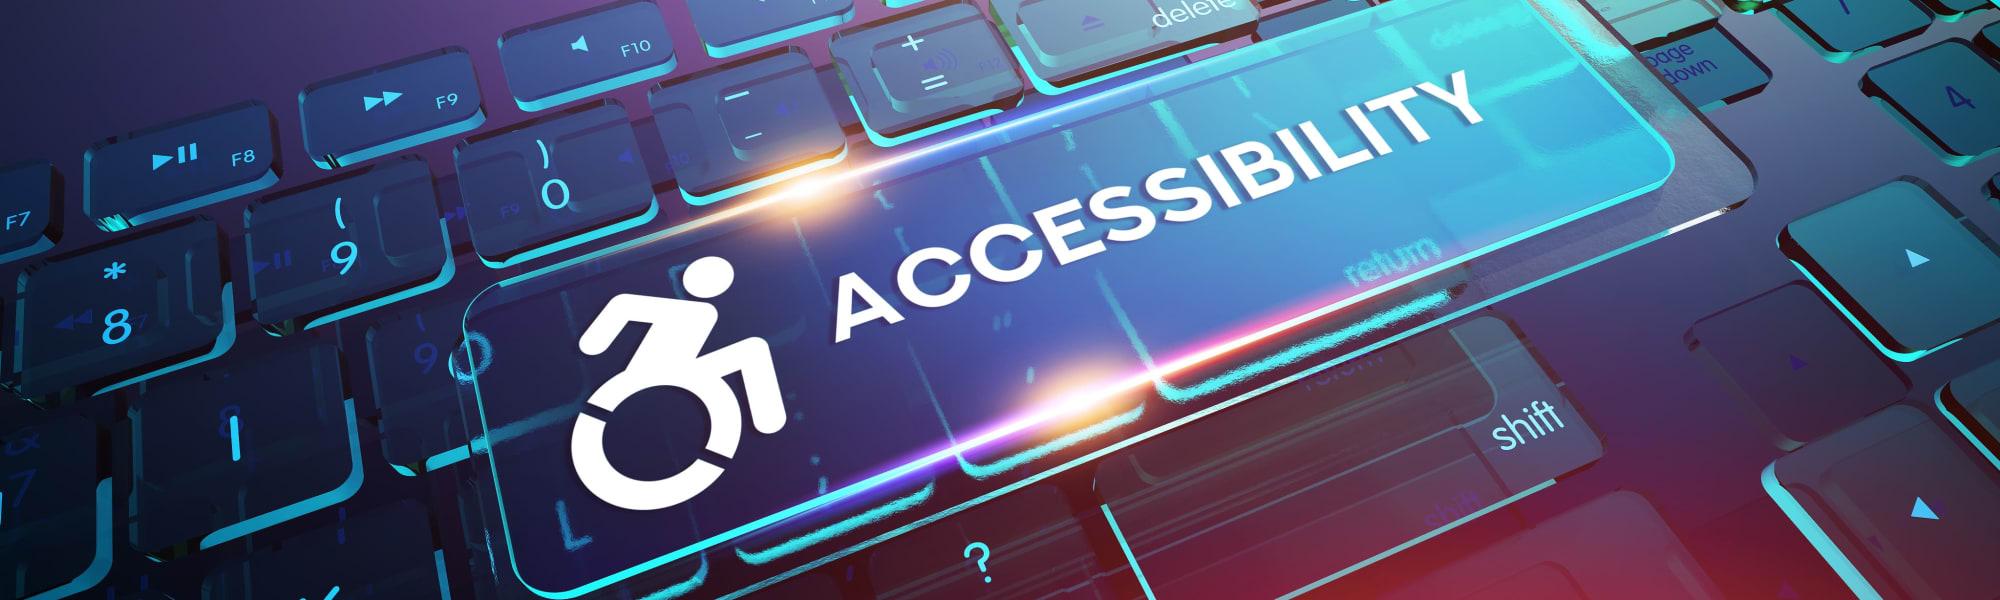 Accessibility policy for Olympus Emerald Coast in Destin, Florida